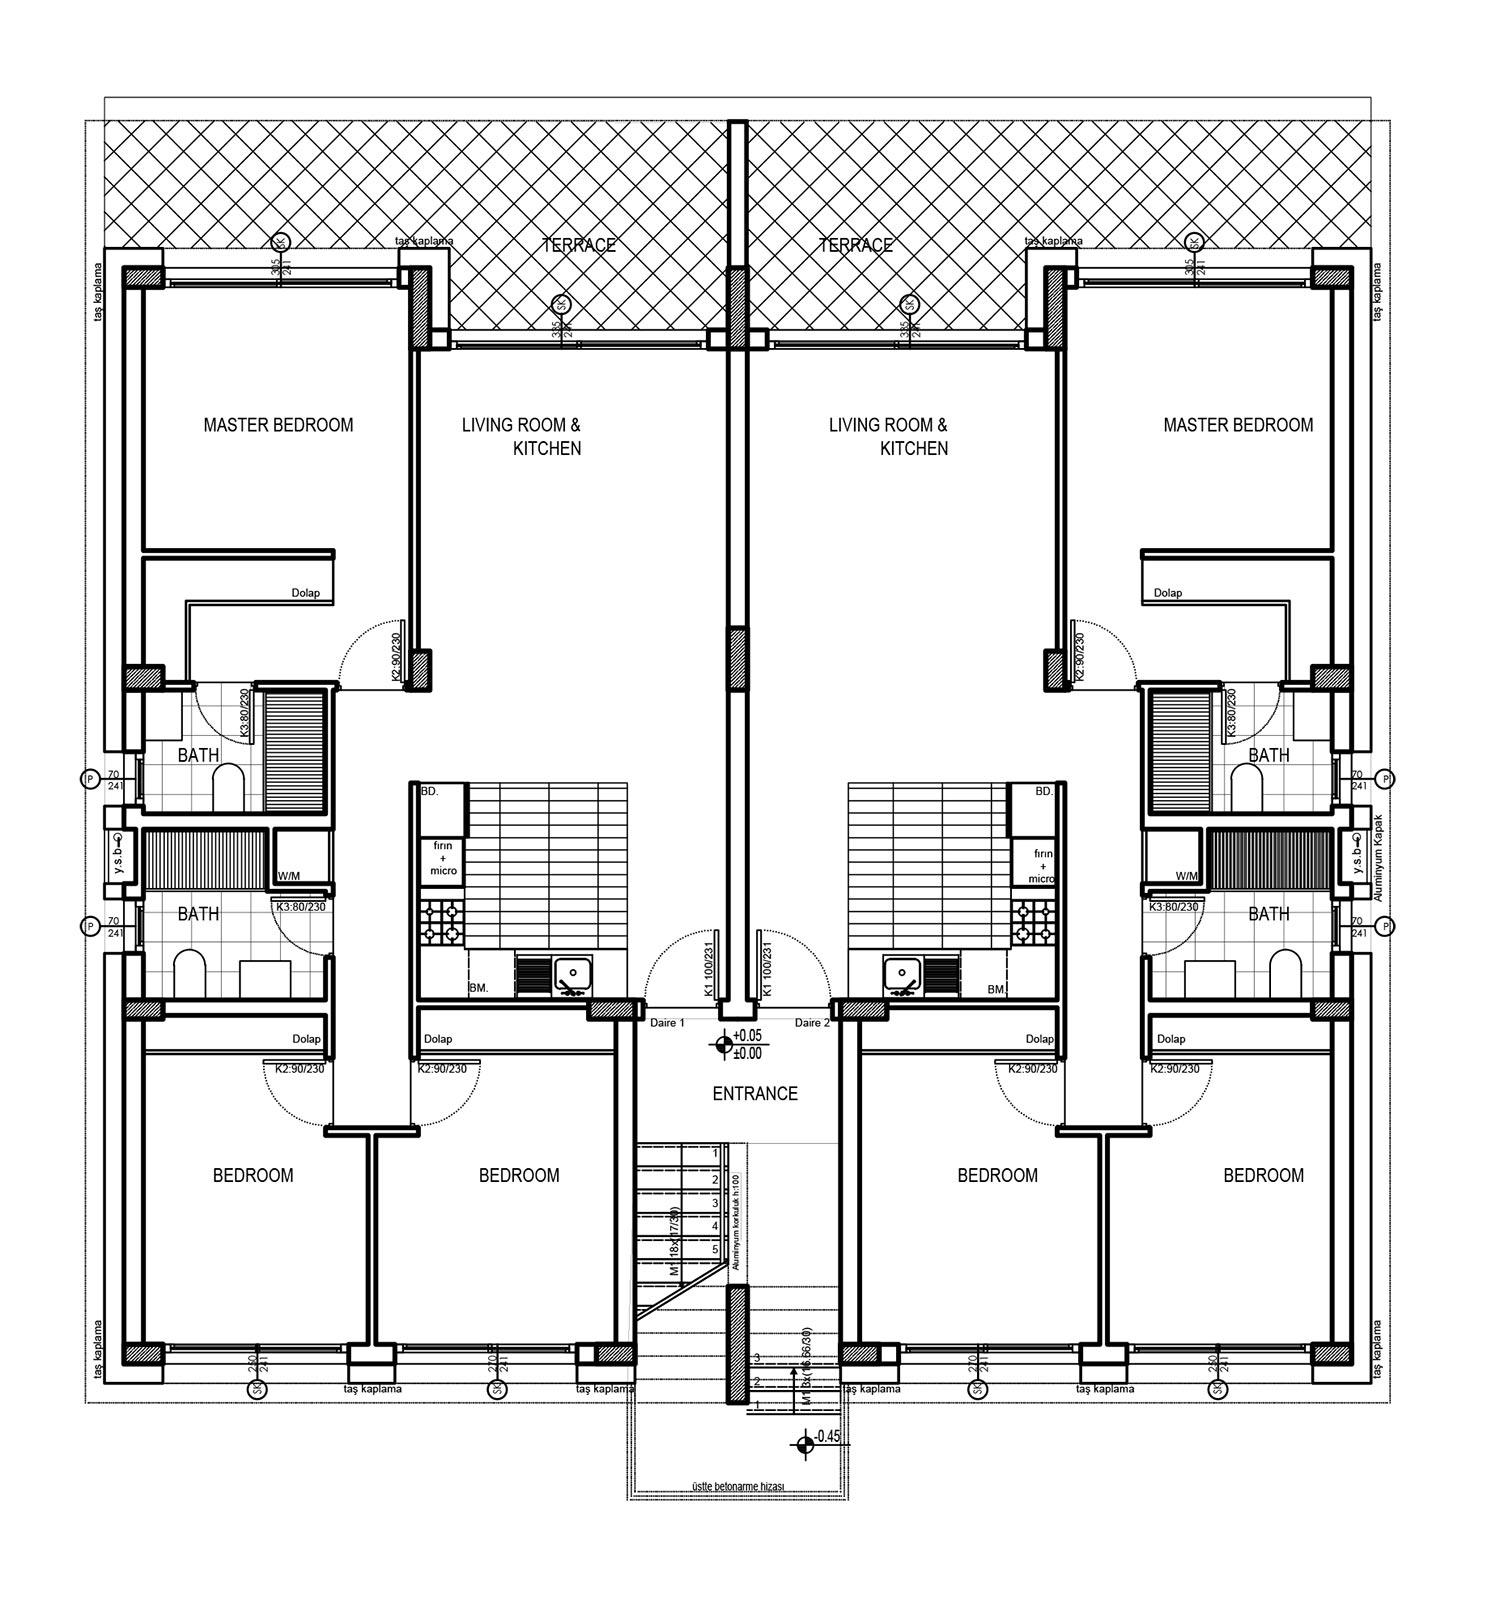 Block 10 - lgh nr: 3 & 4 - takvåning med 3 sovrum